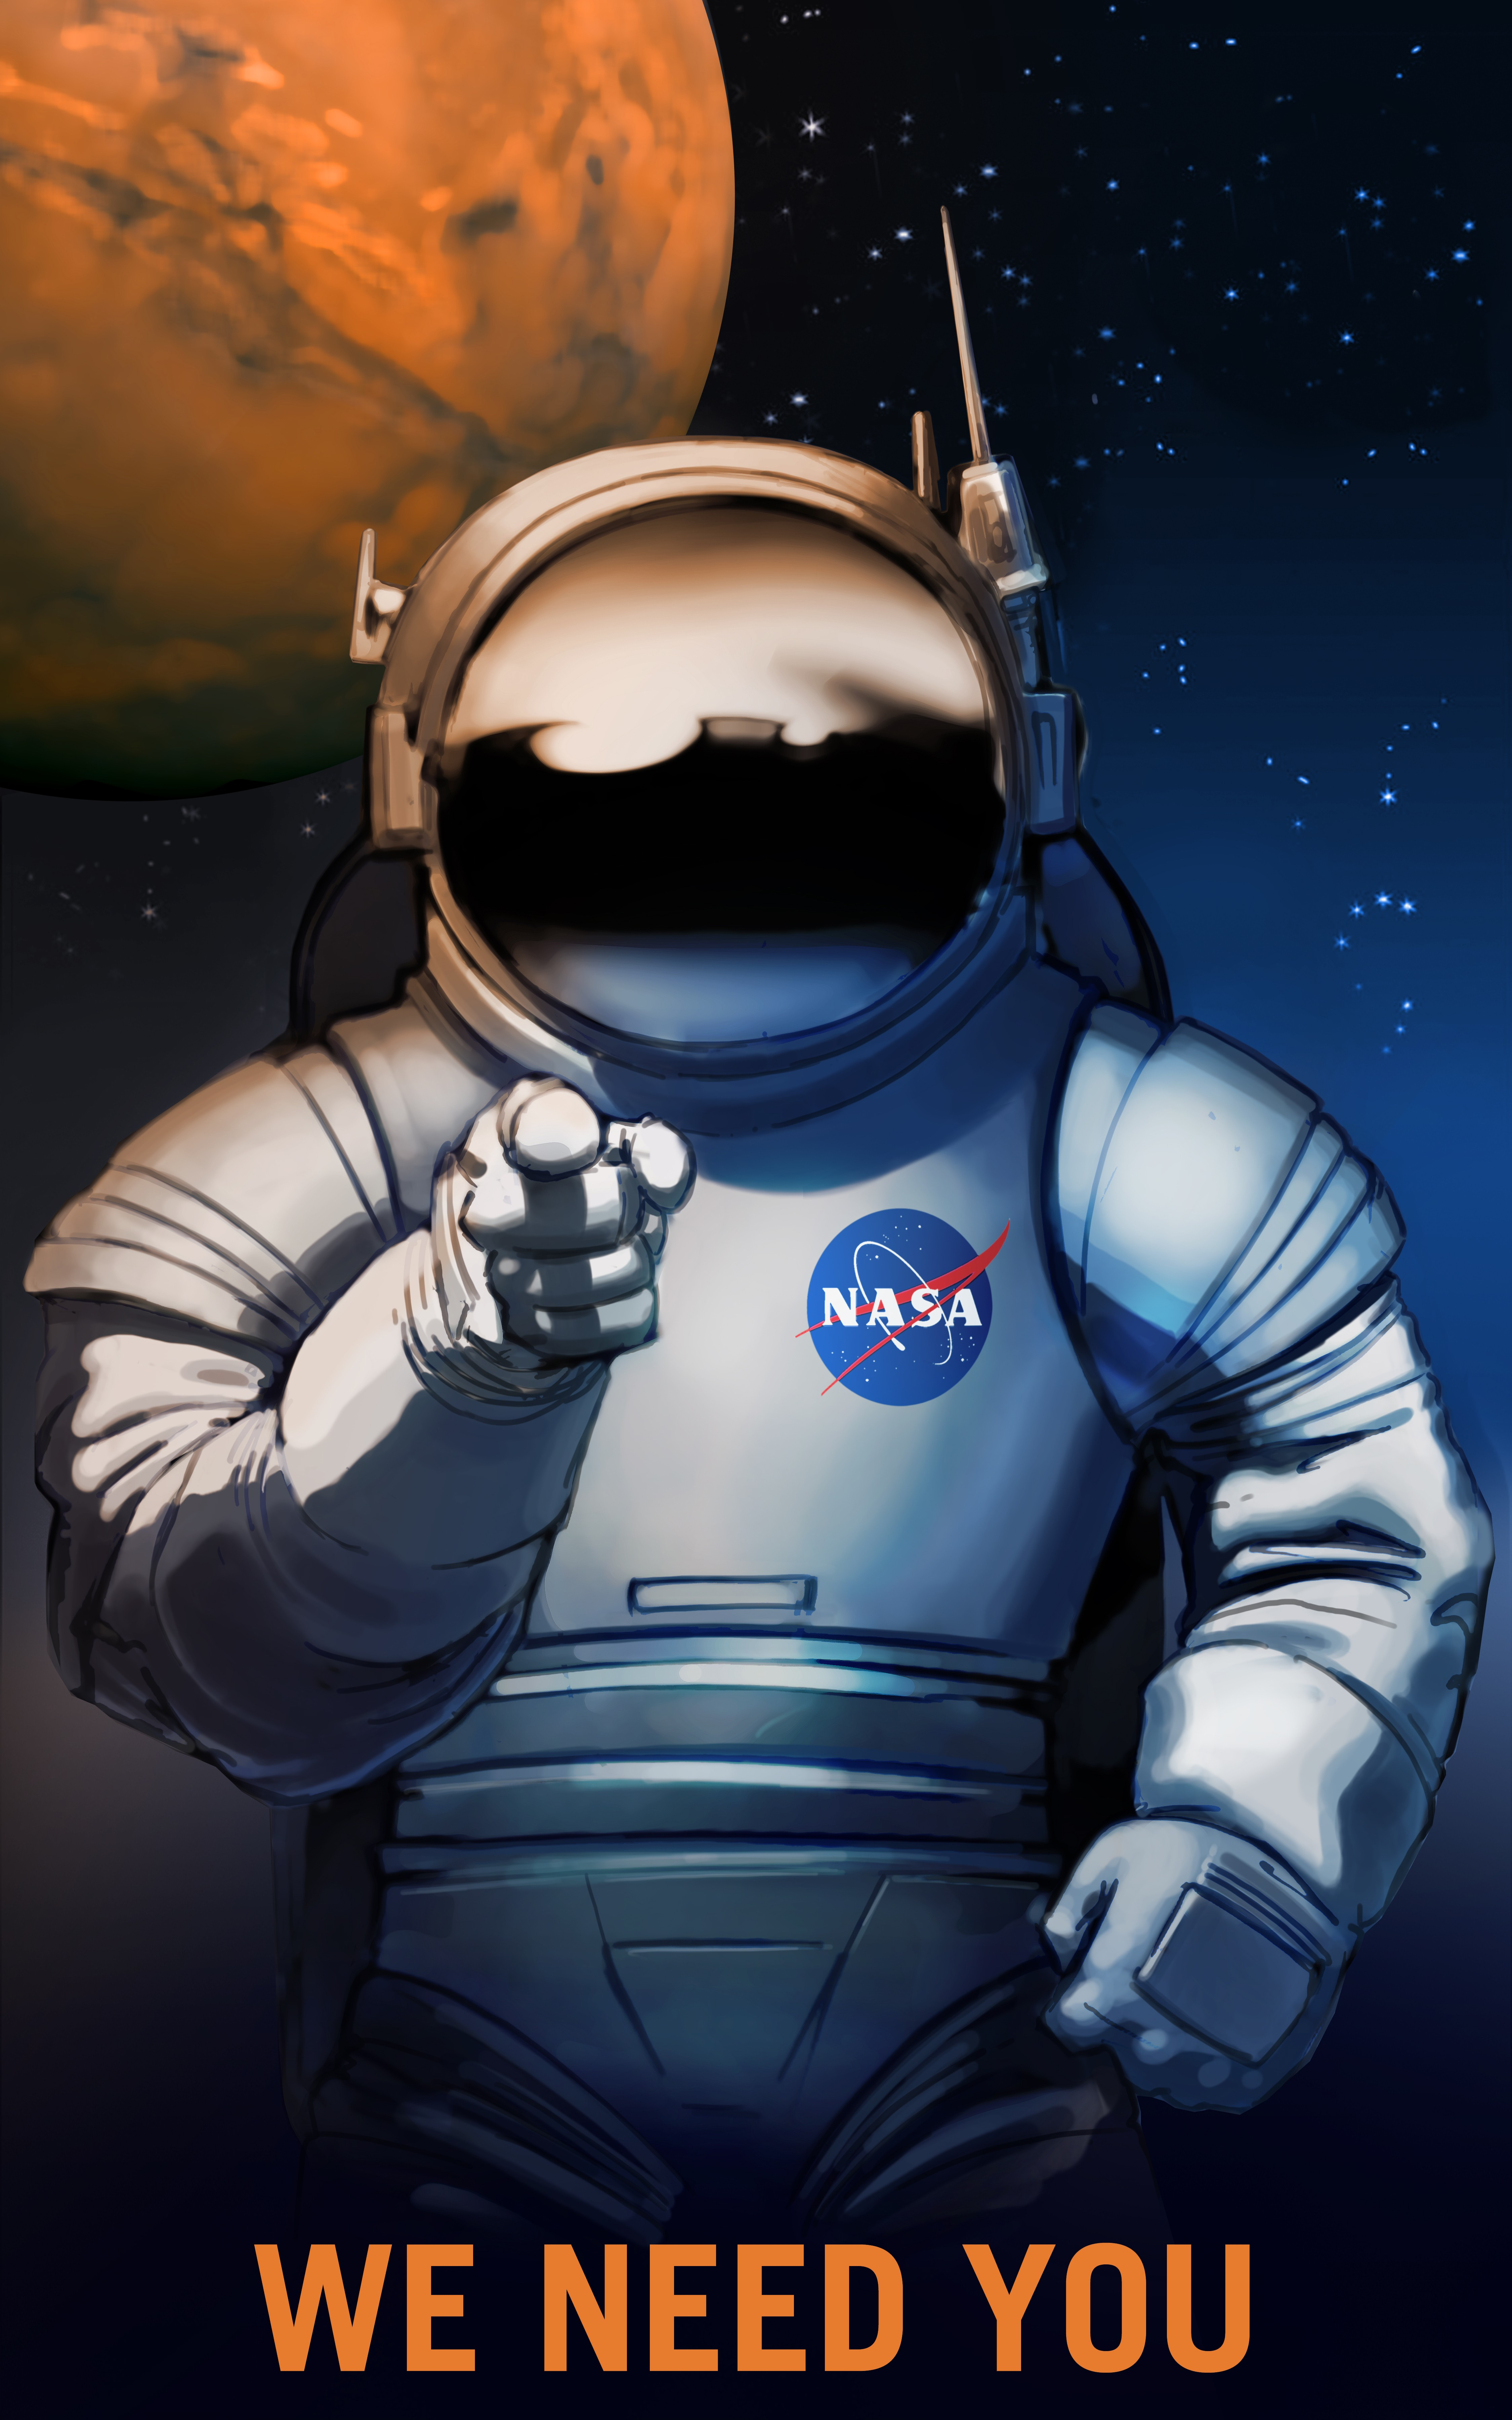 General 4500x7200 NASA Mars space suit